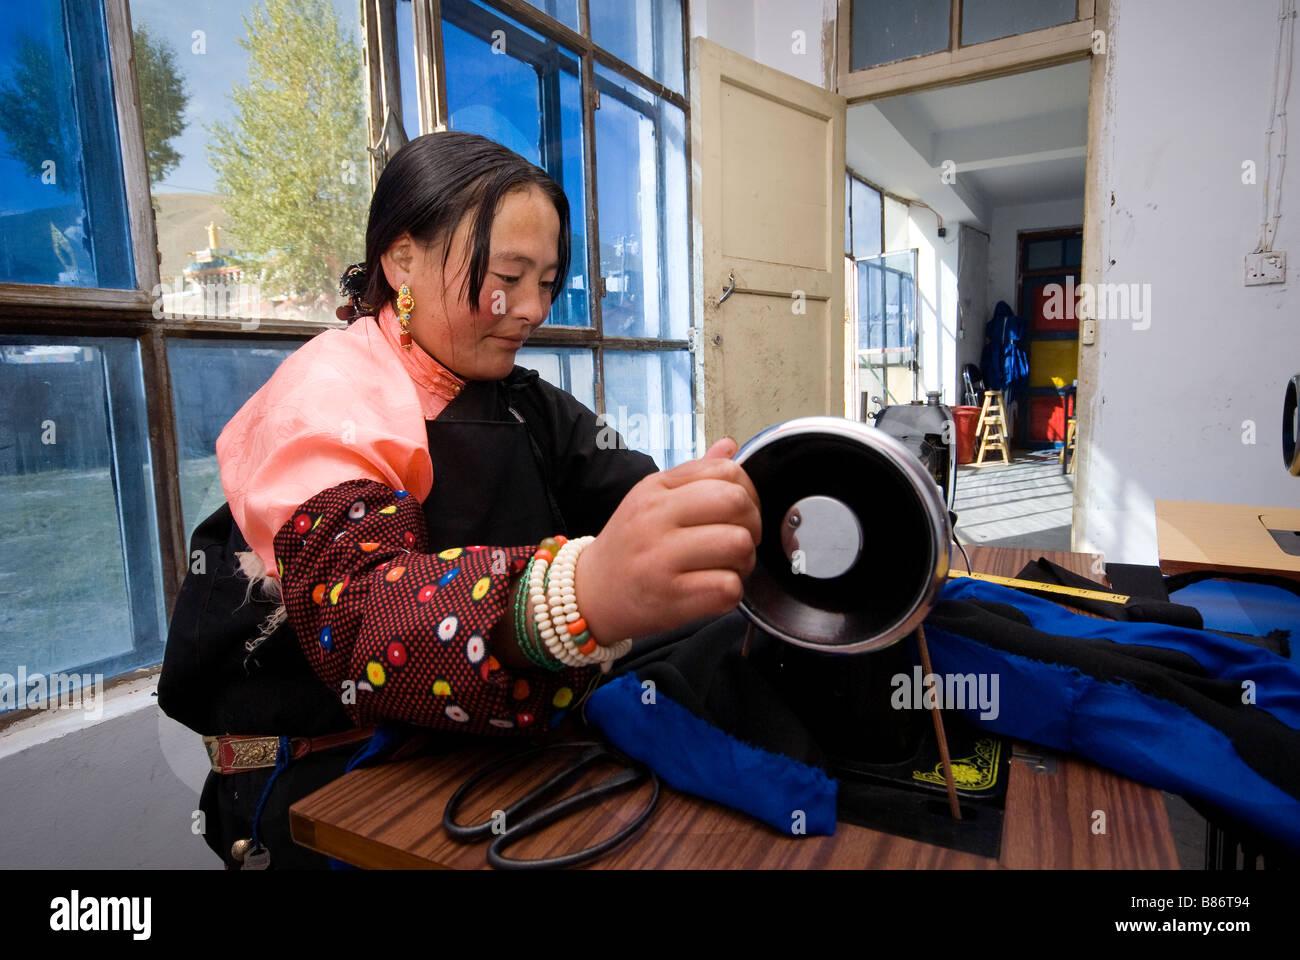 Tibetan woman taking sewing classes. Stock Photo